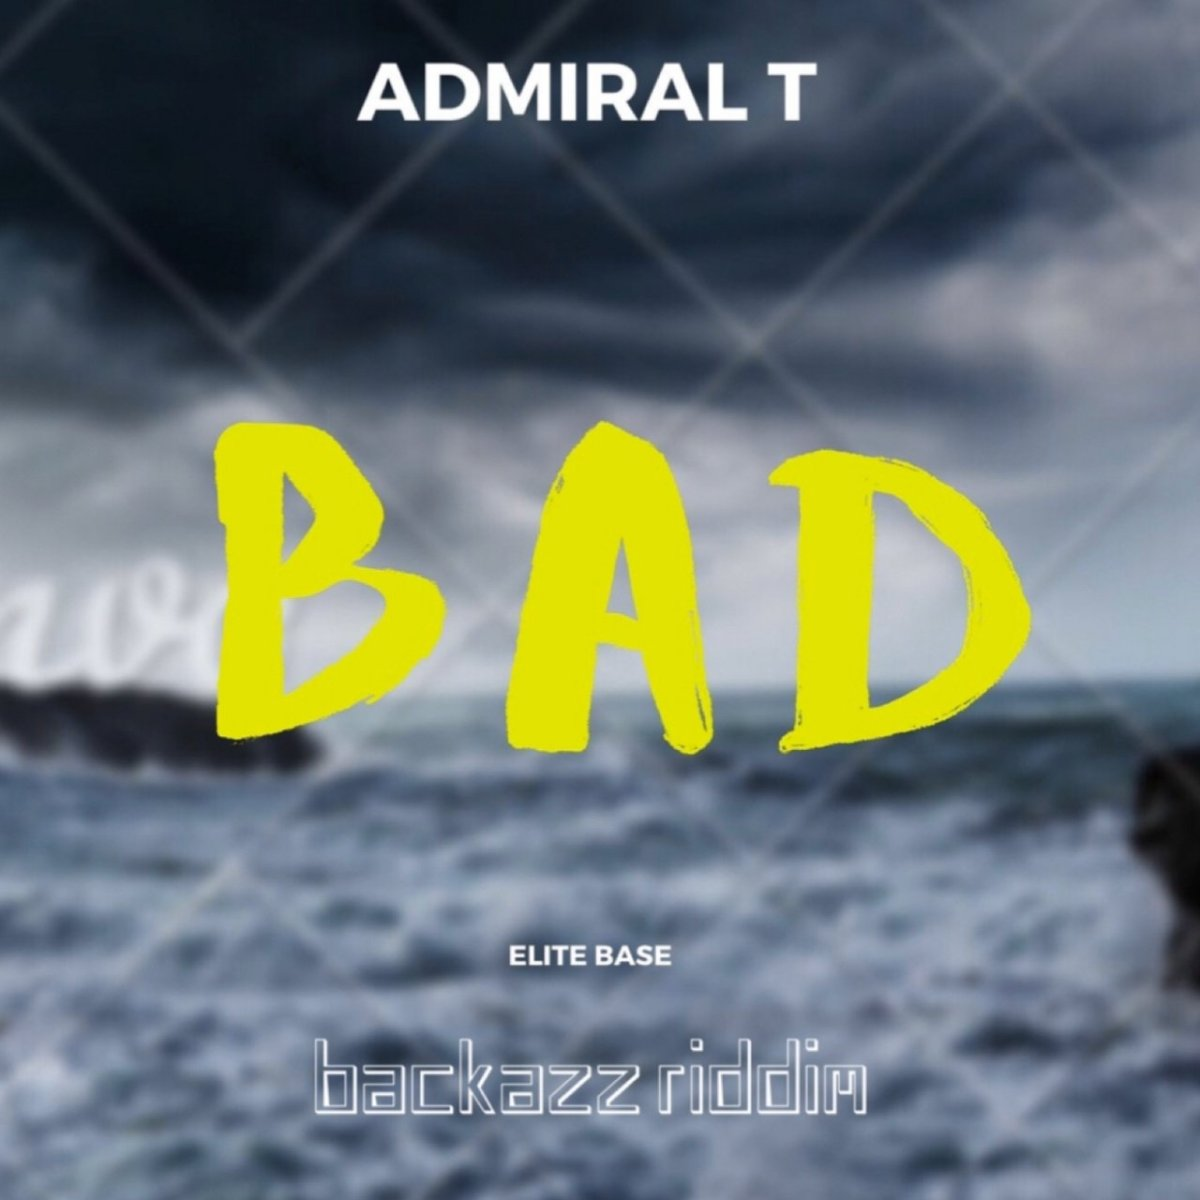 Admiral T - Bad (Backazz Riddim) (Cover)